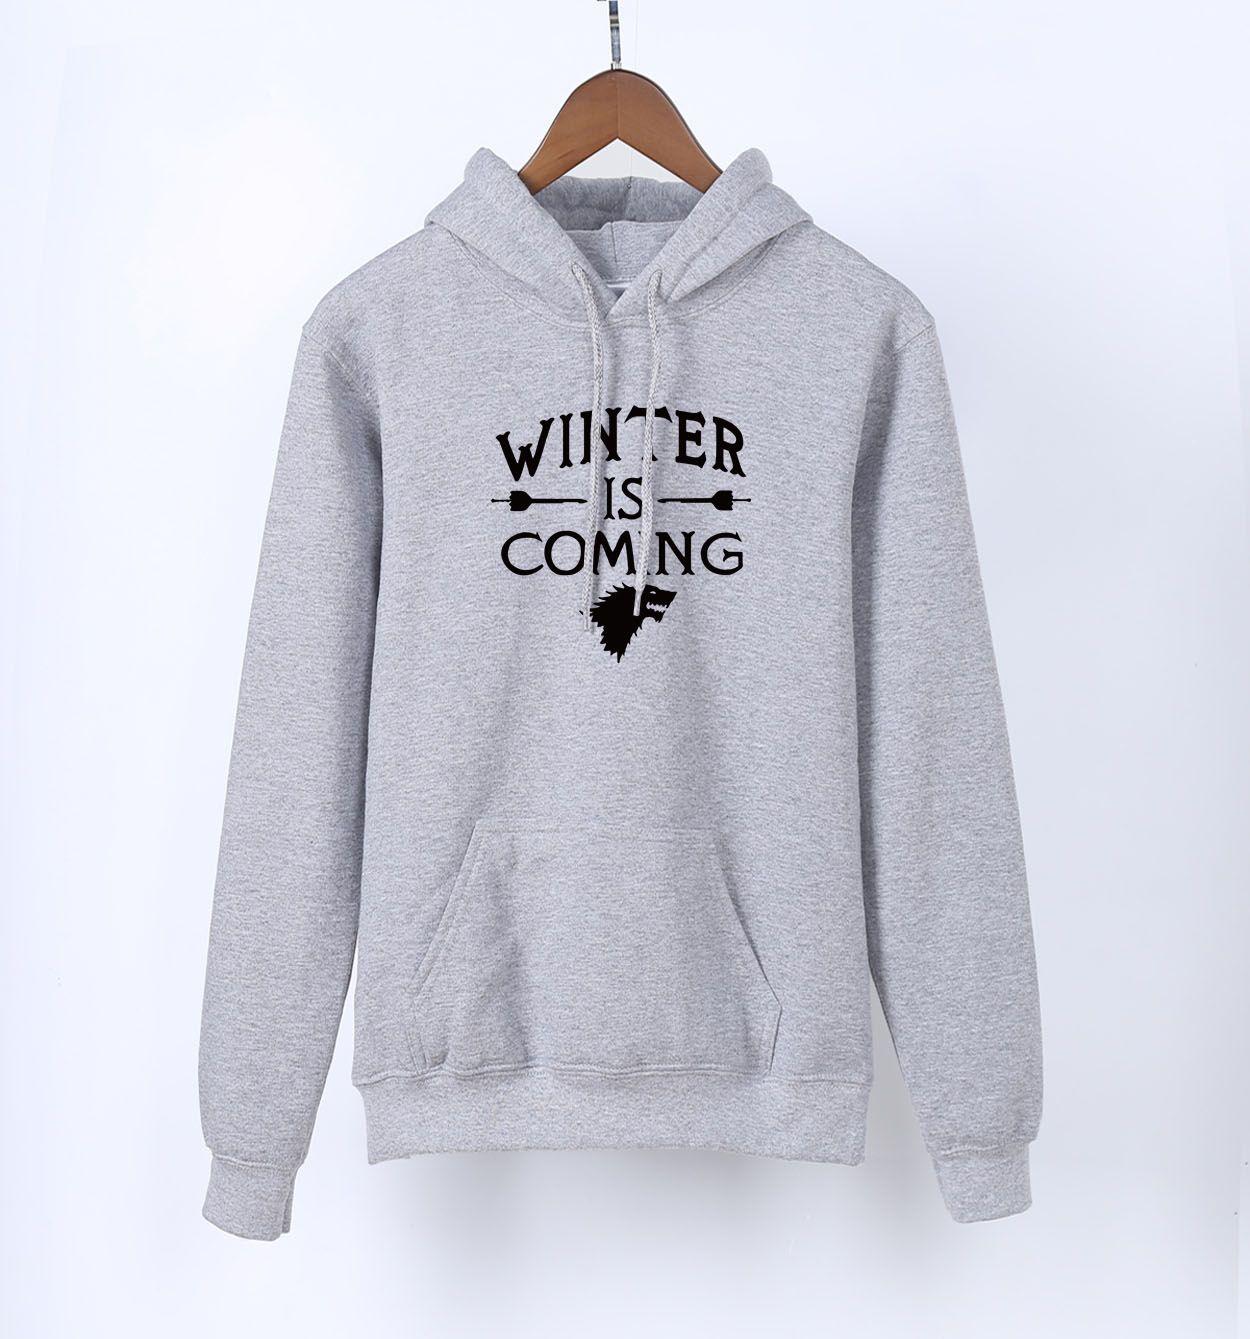 fd8935f5a7aa8 2019 Games Of Thrones Hot Sale Women'S Hoodies 2018 Spring Autumn Kawaii  Sweatshirts Women Hoodies Long Sleeve Hooded Brand Clothing From Qingxin13,  ...